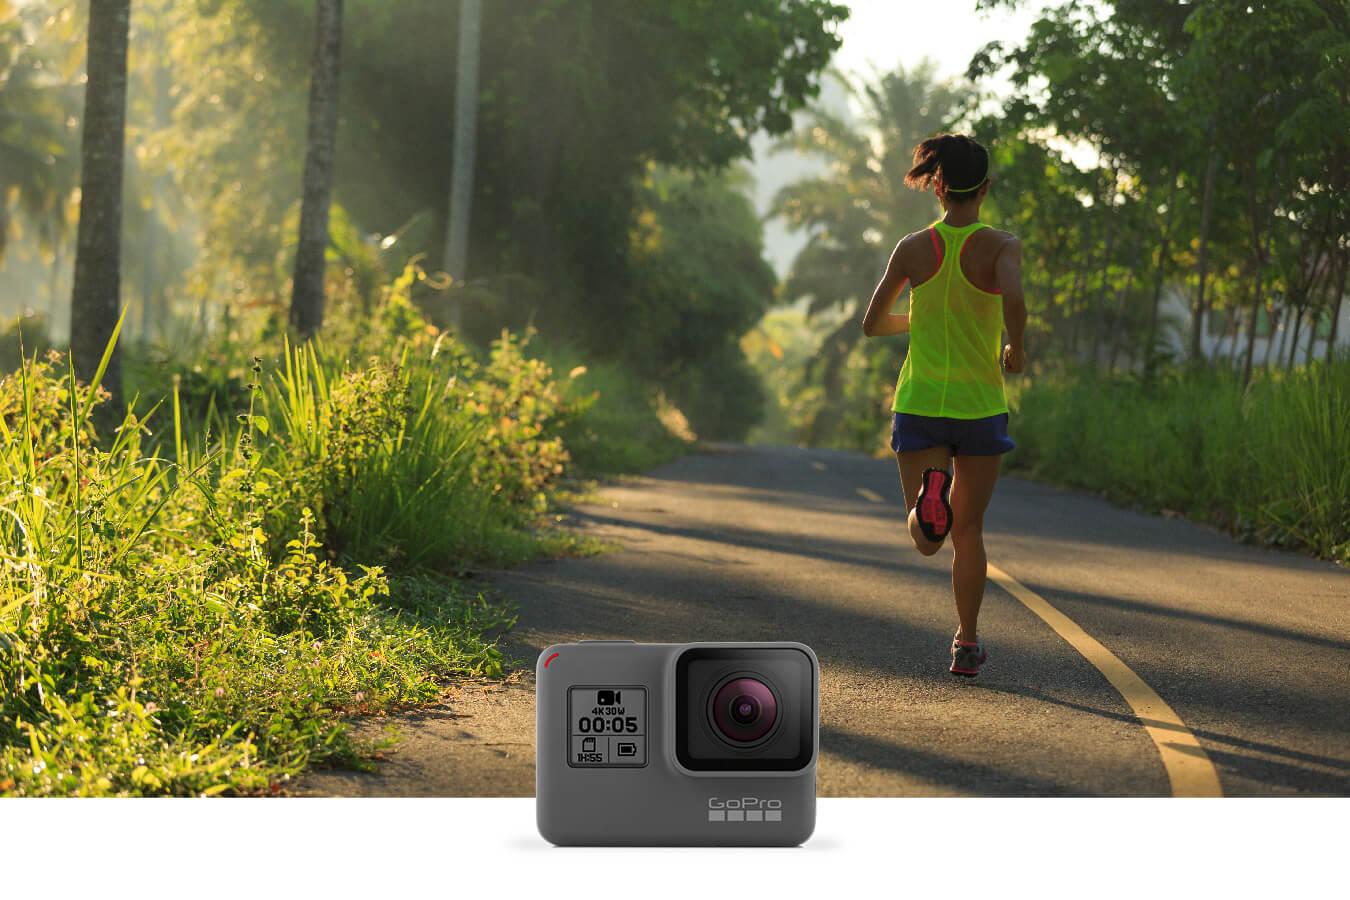 NAGRADNI NATJEČAJ: PoKRENI se i uhvati GoPro HERO5 Black kameru!